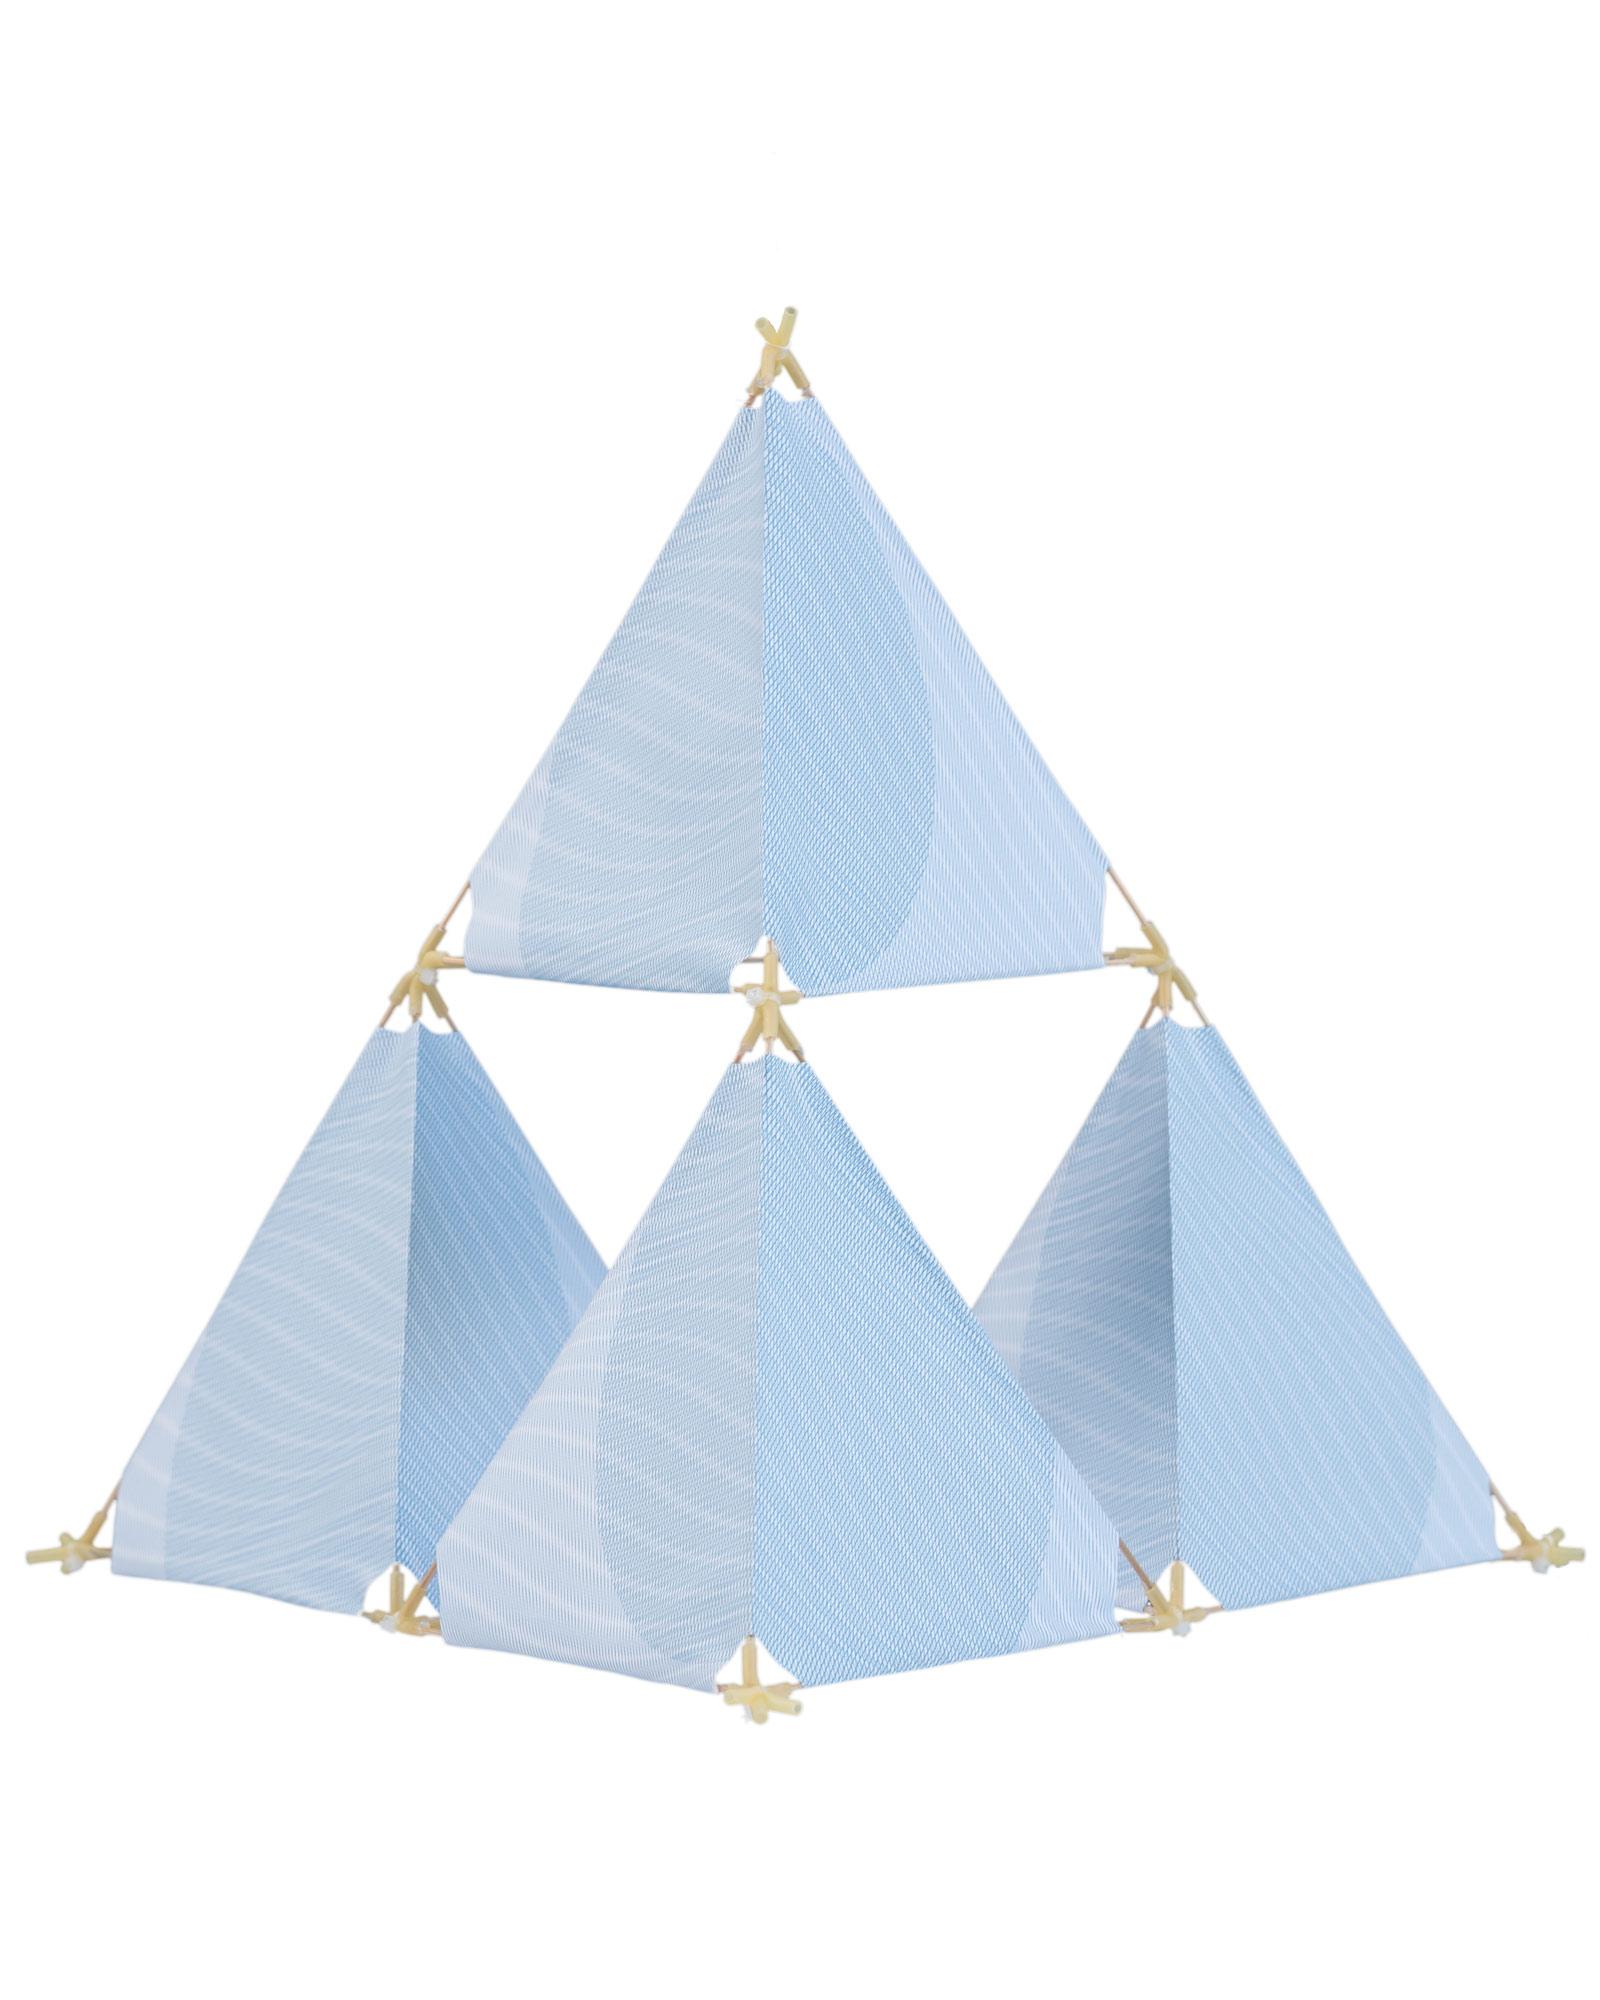 Bell Tetrahedron